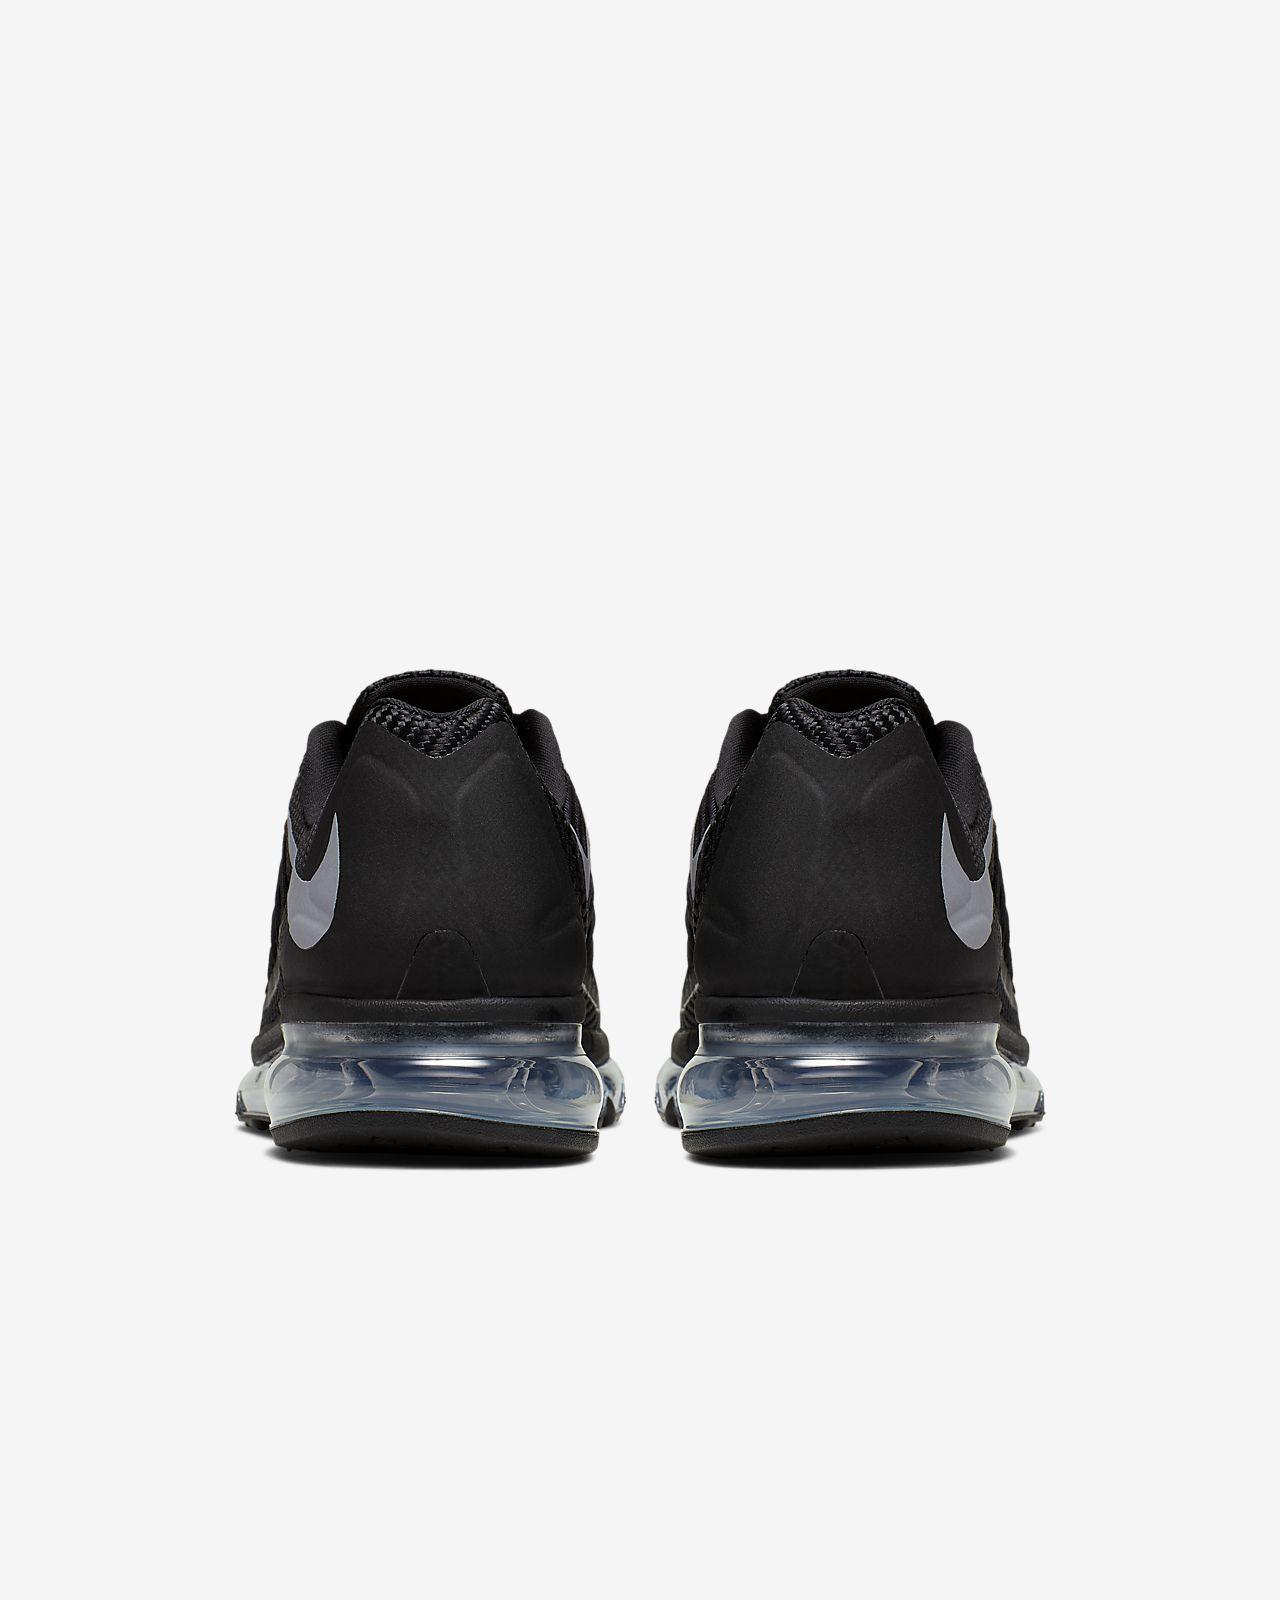 Nike Air Max 2015 Herenschoen